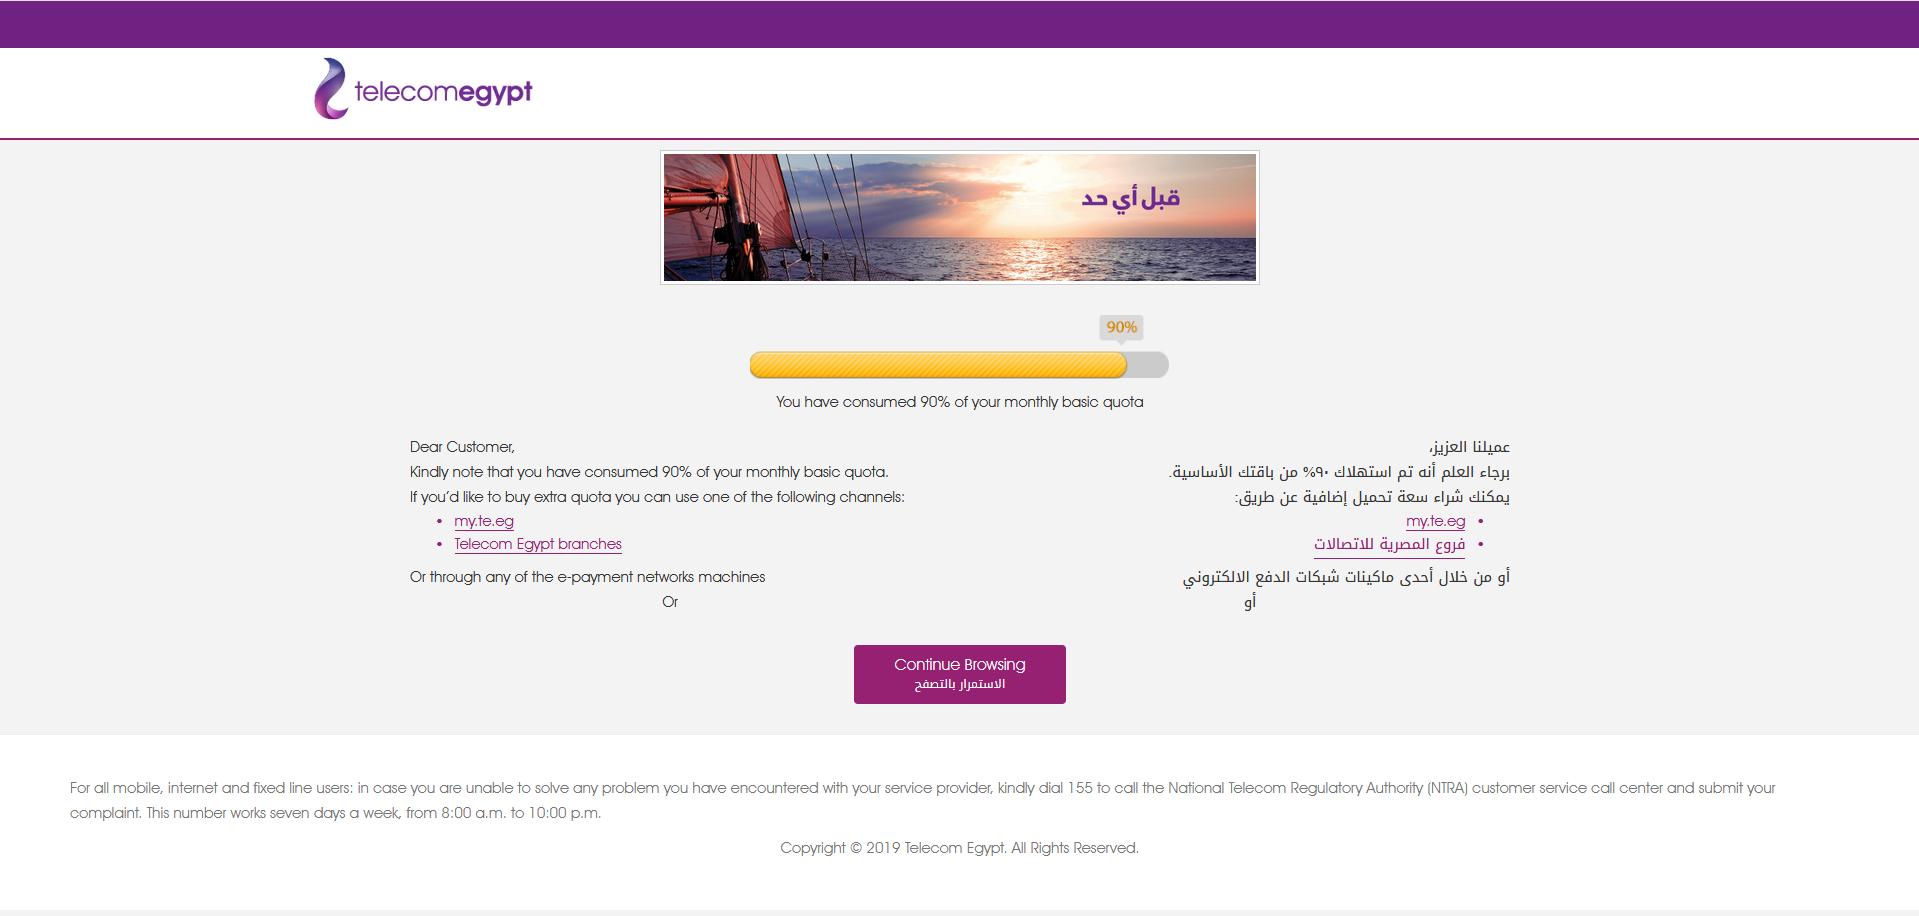 Tedata telecom egypt internet المصرية للاتصالات